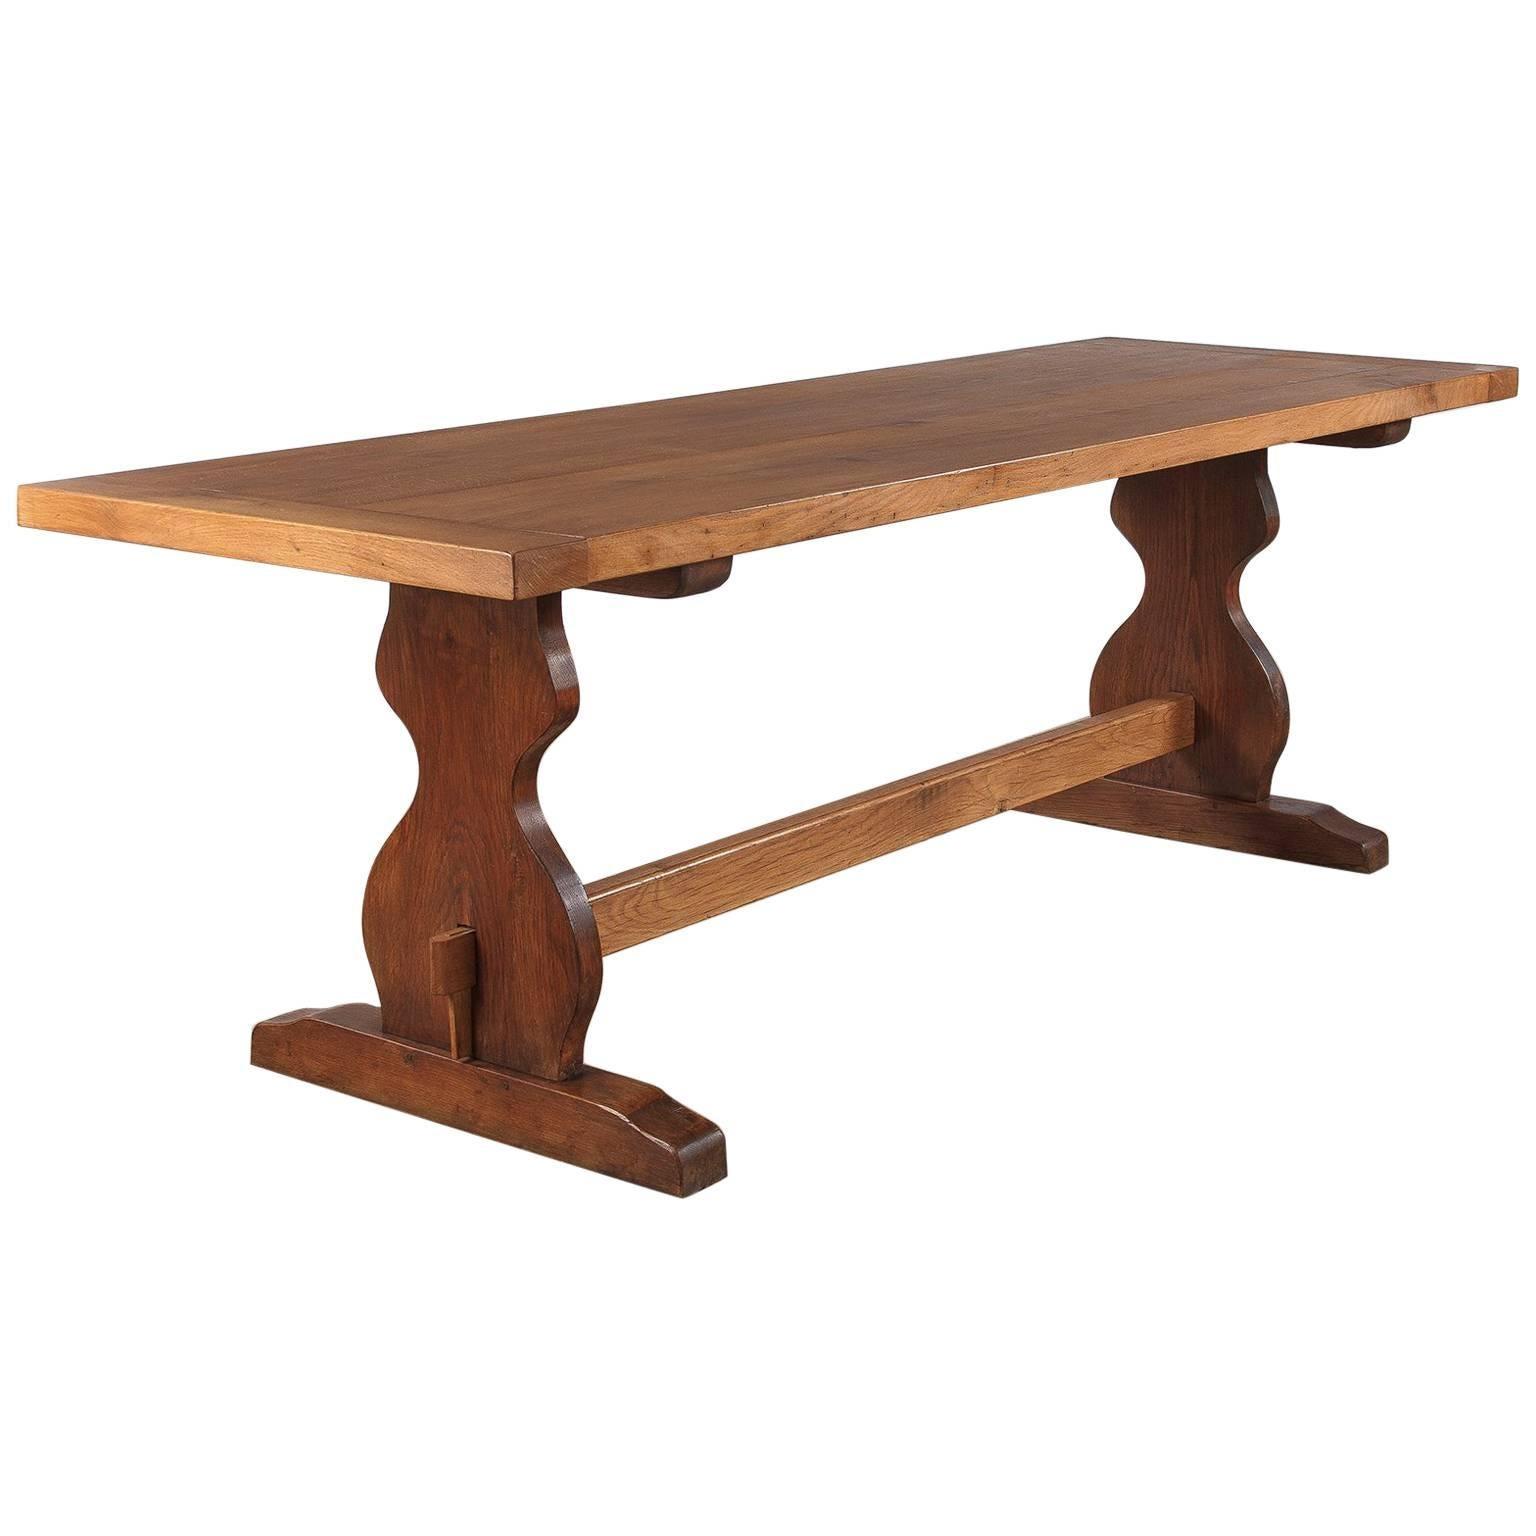 French Golden Oak Trestle Table, 1940s